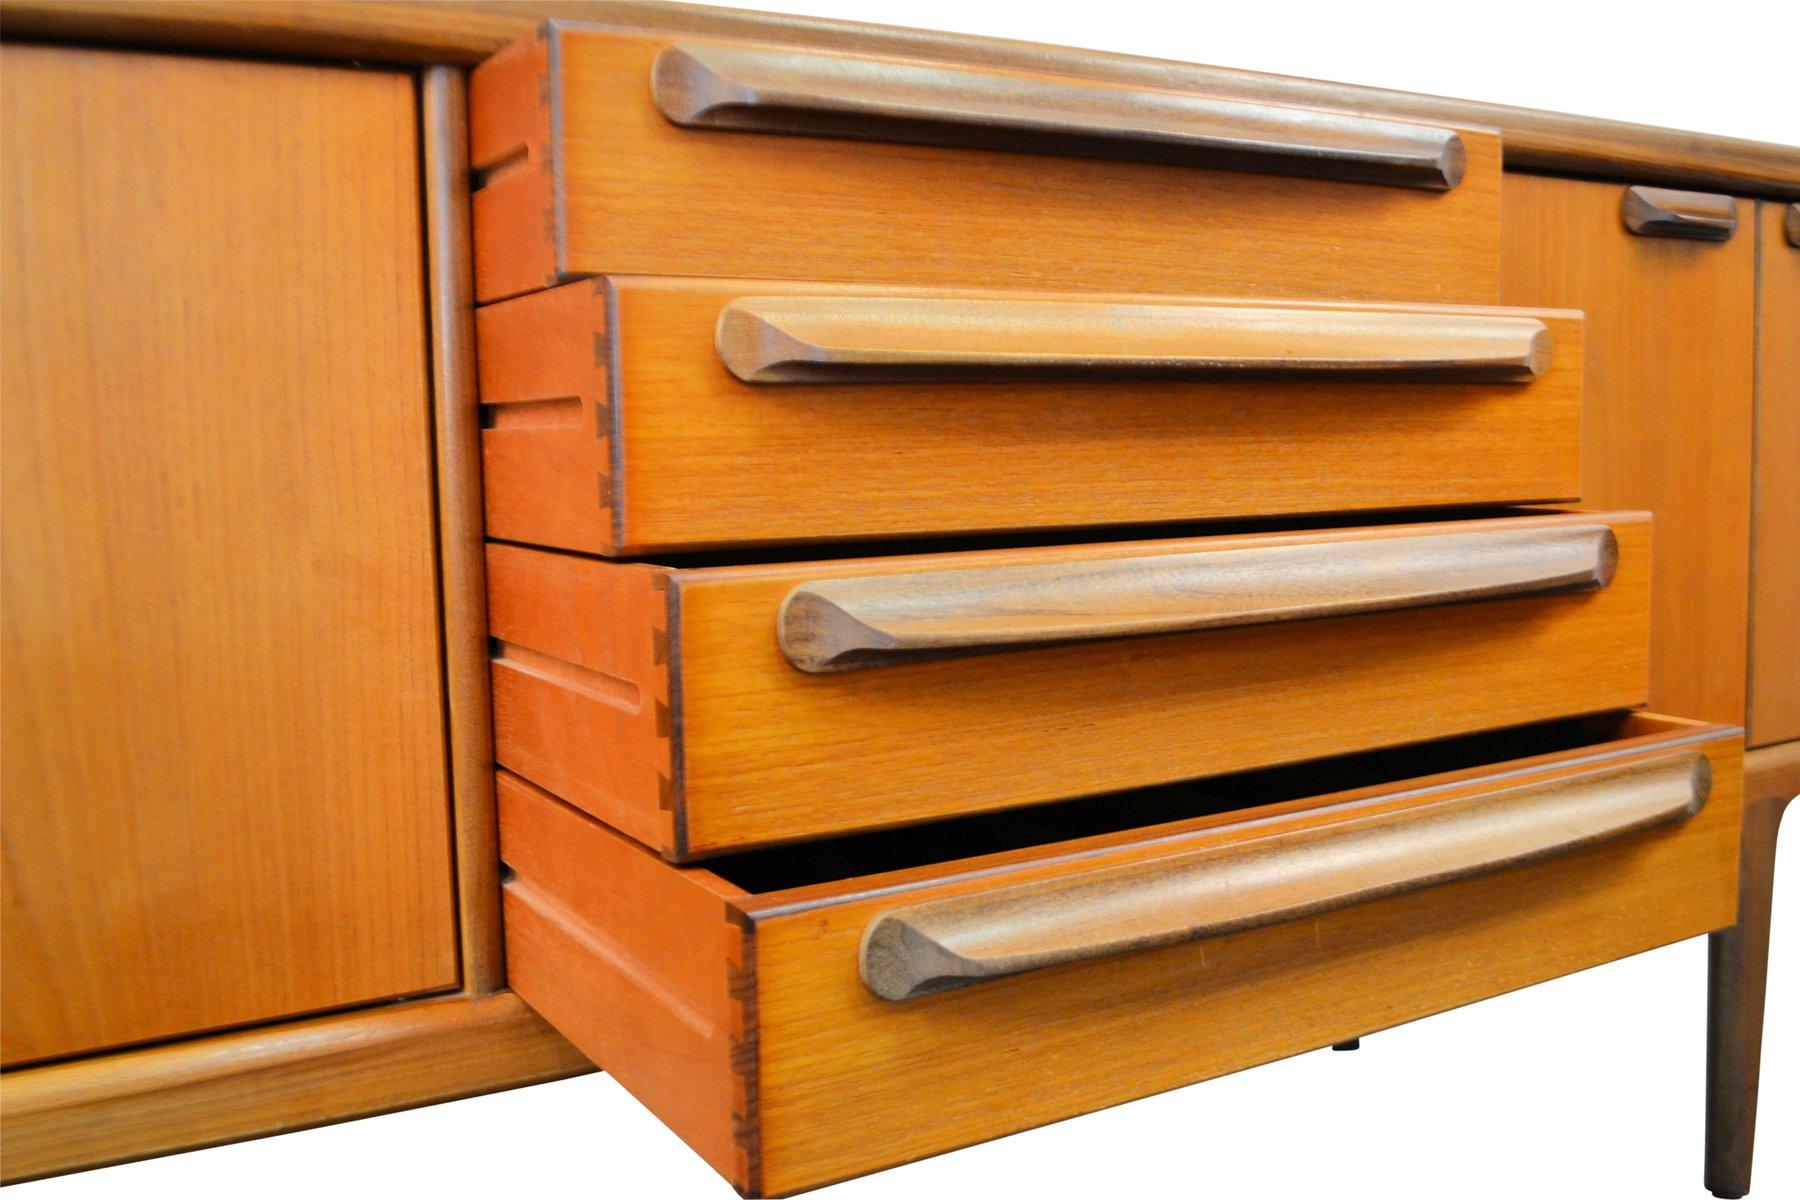 La Credenza Ltd : Bespoke oak credenza london modern hallway landing